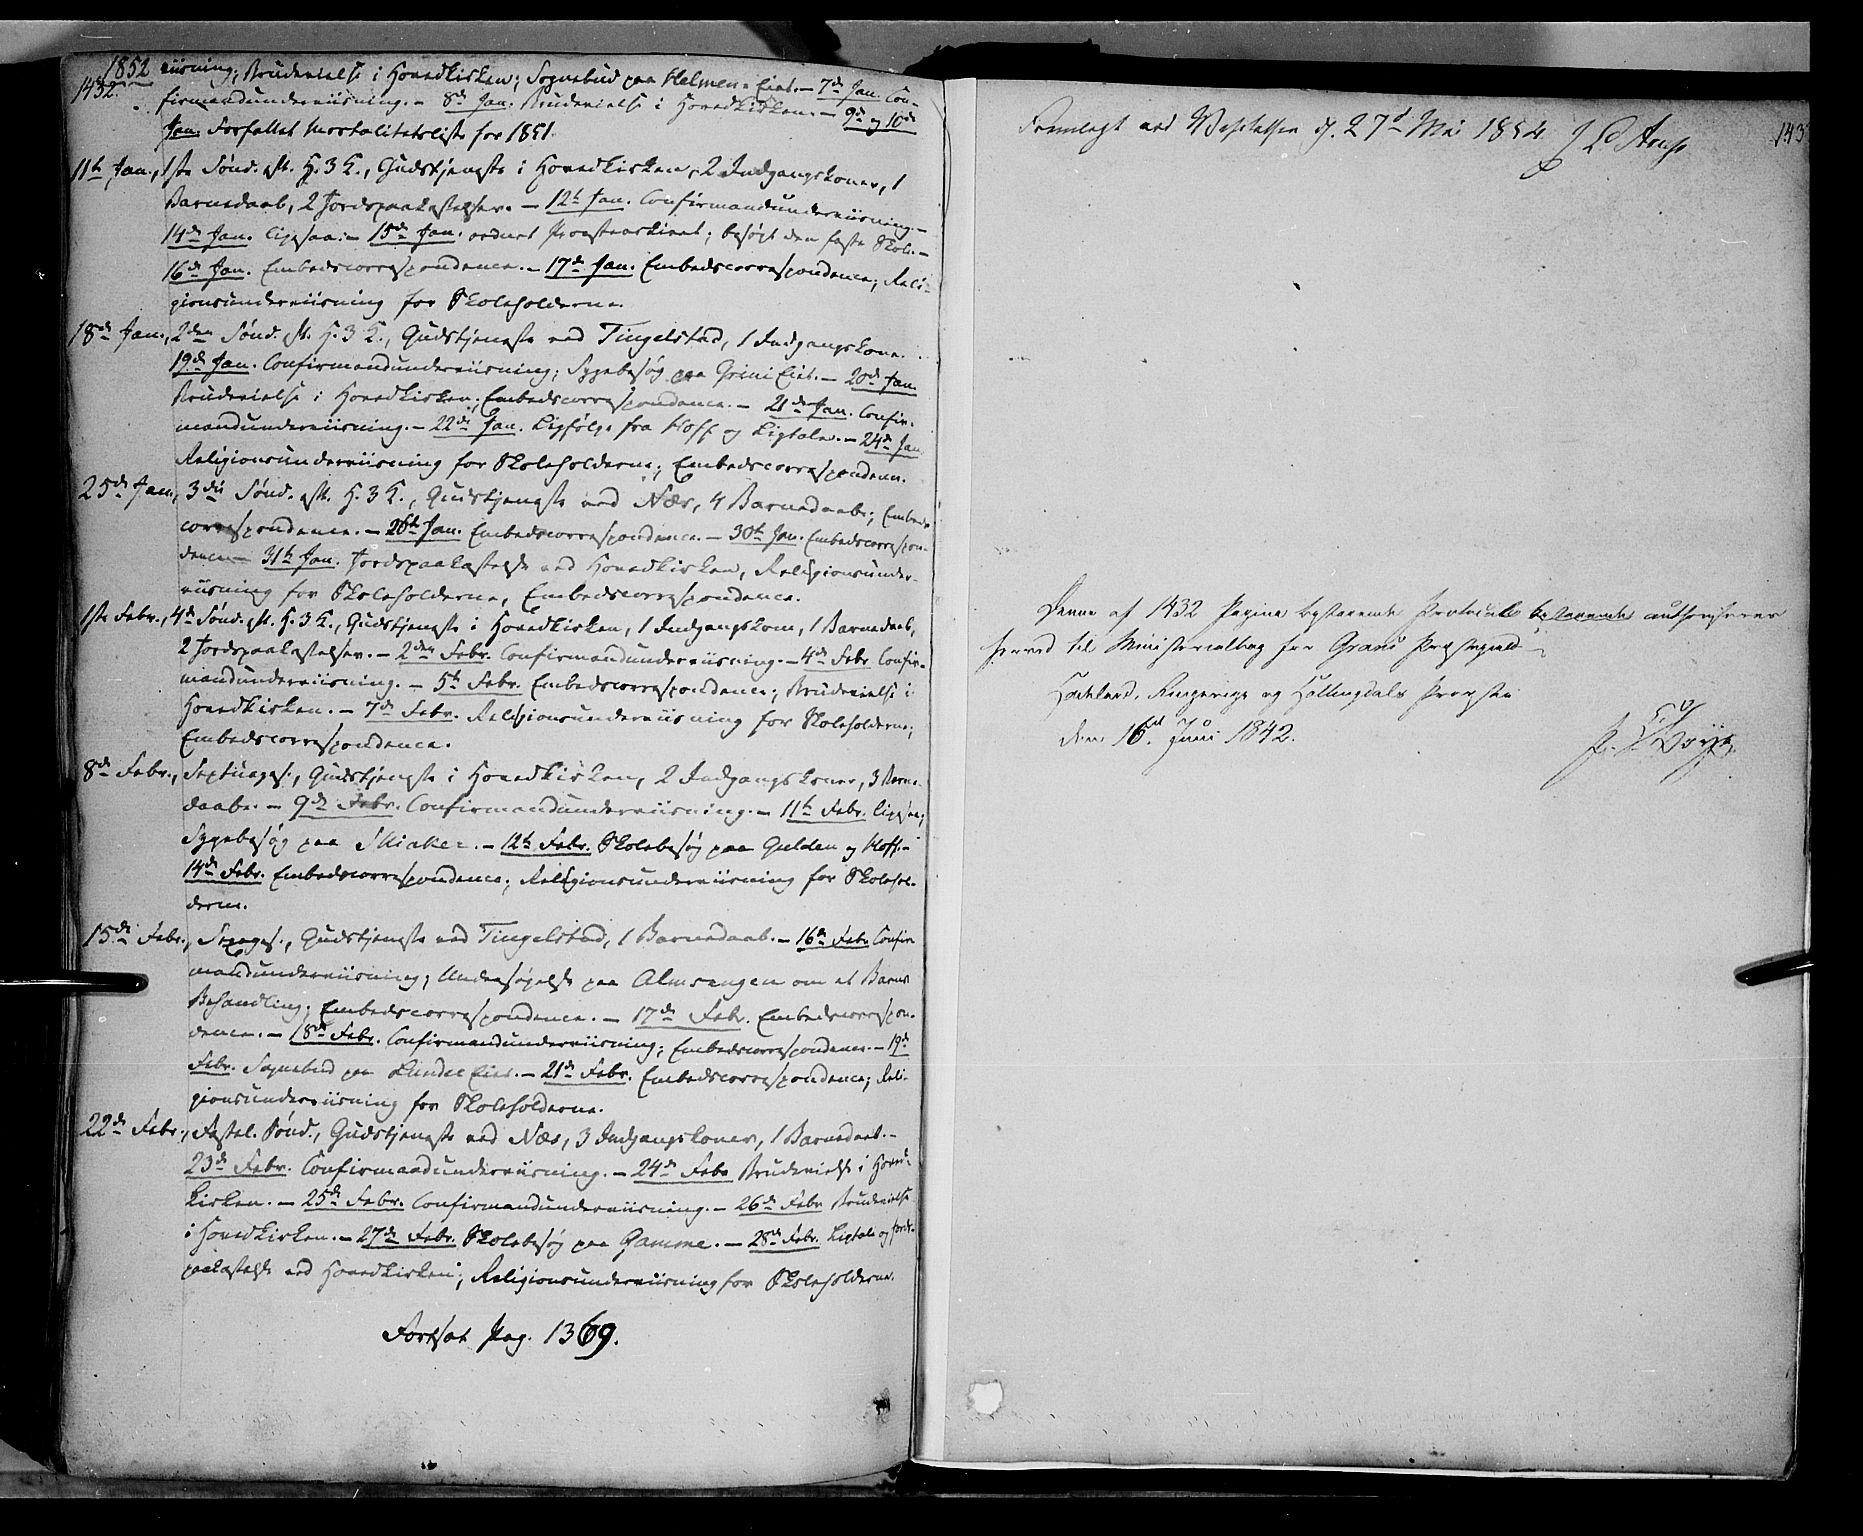 SAH, Gran prestekontor, Ministerialbok nr. 11, 1842-1856, s. 1432-1433